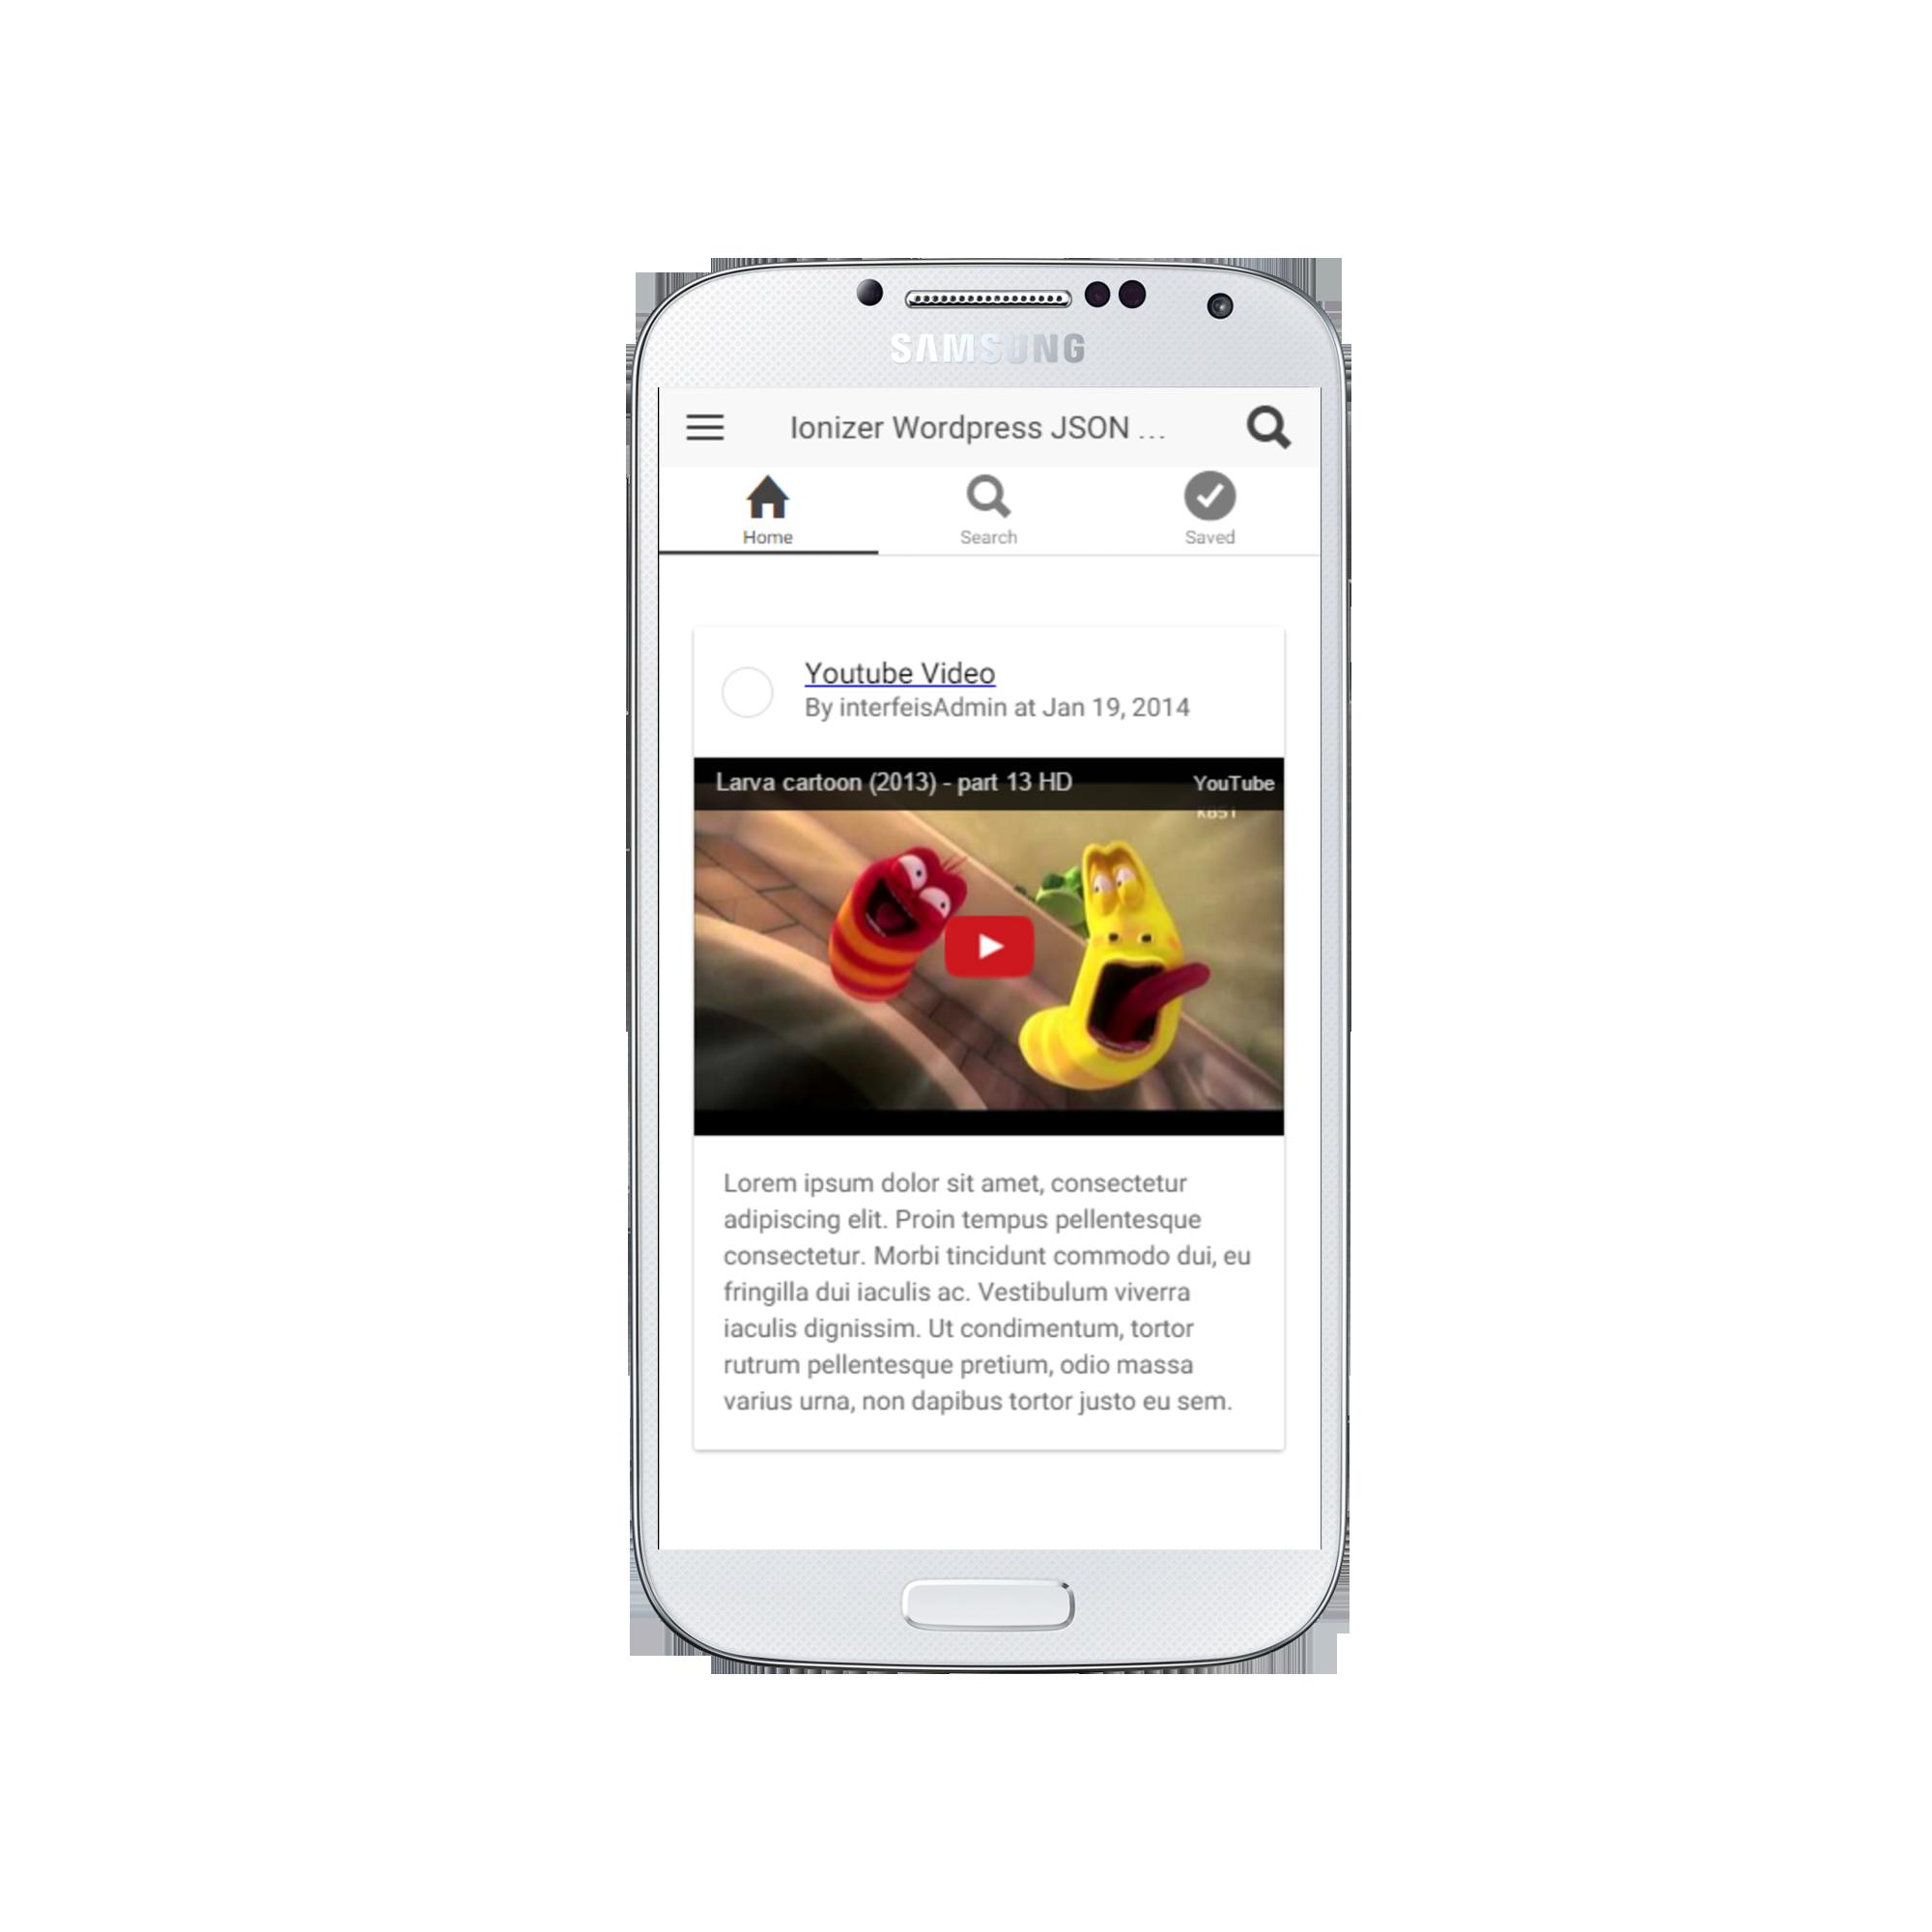 Ionizer - Ionic, AngularJS & Cordova App Template & Example